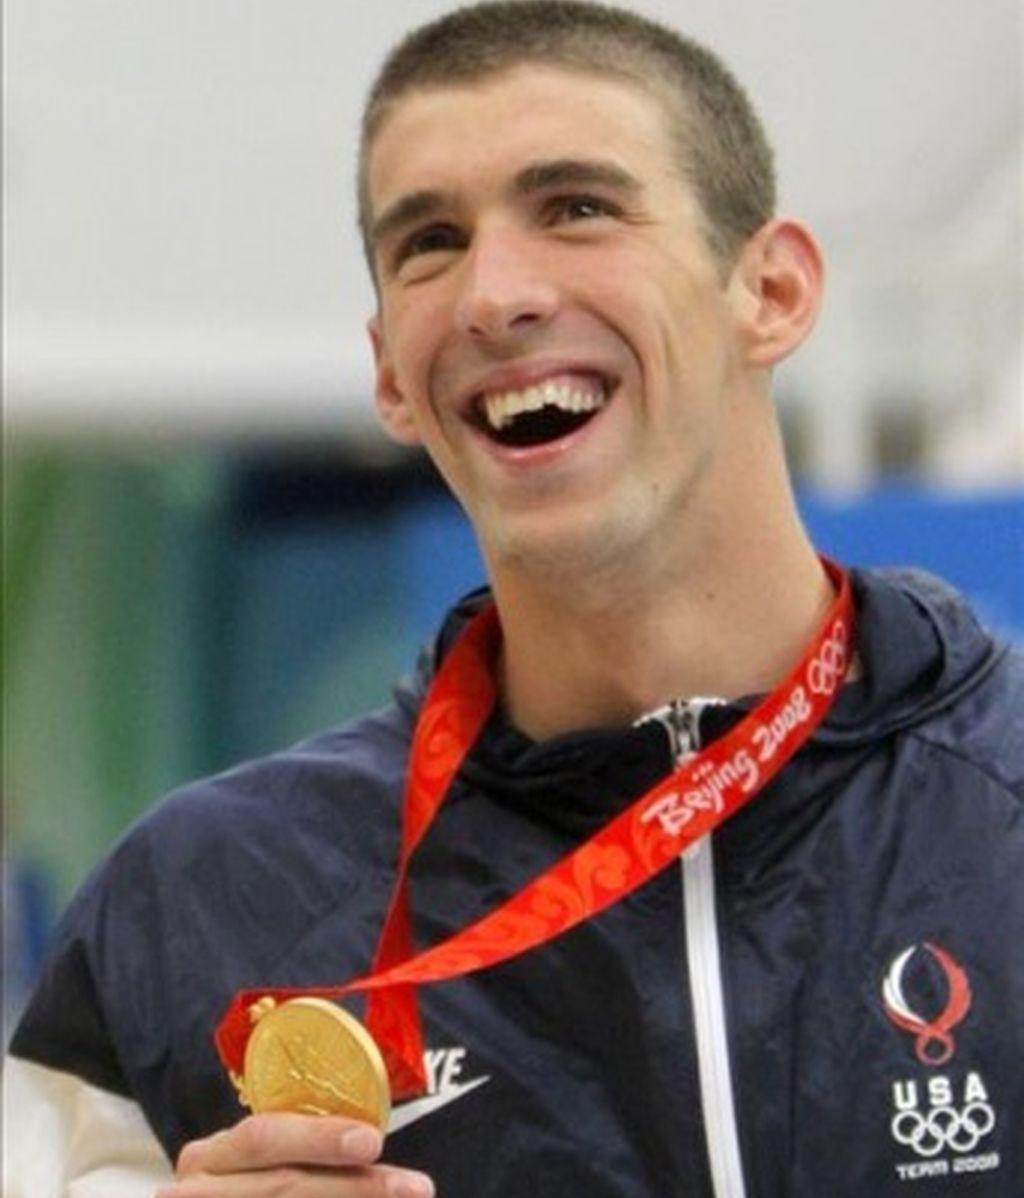 Séptimo oro para Phelps en 100 metros mariposa